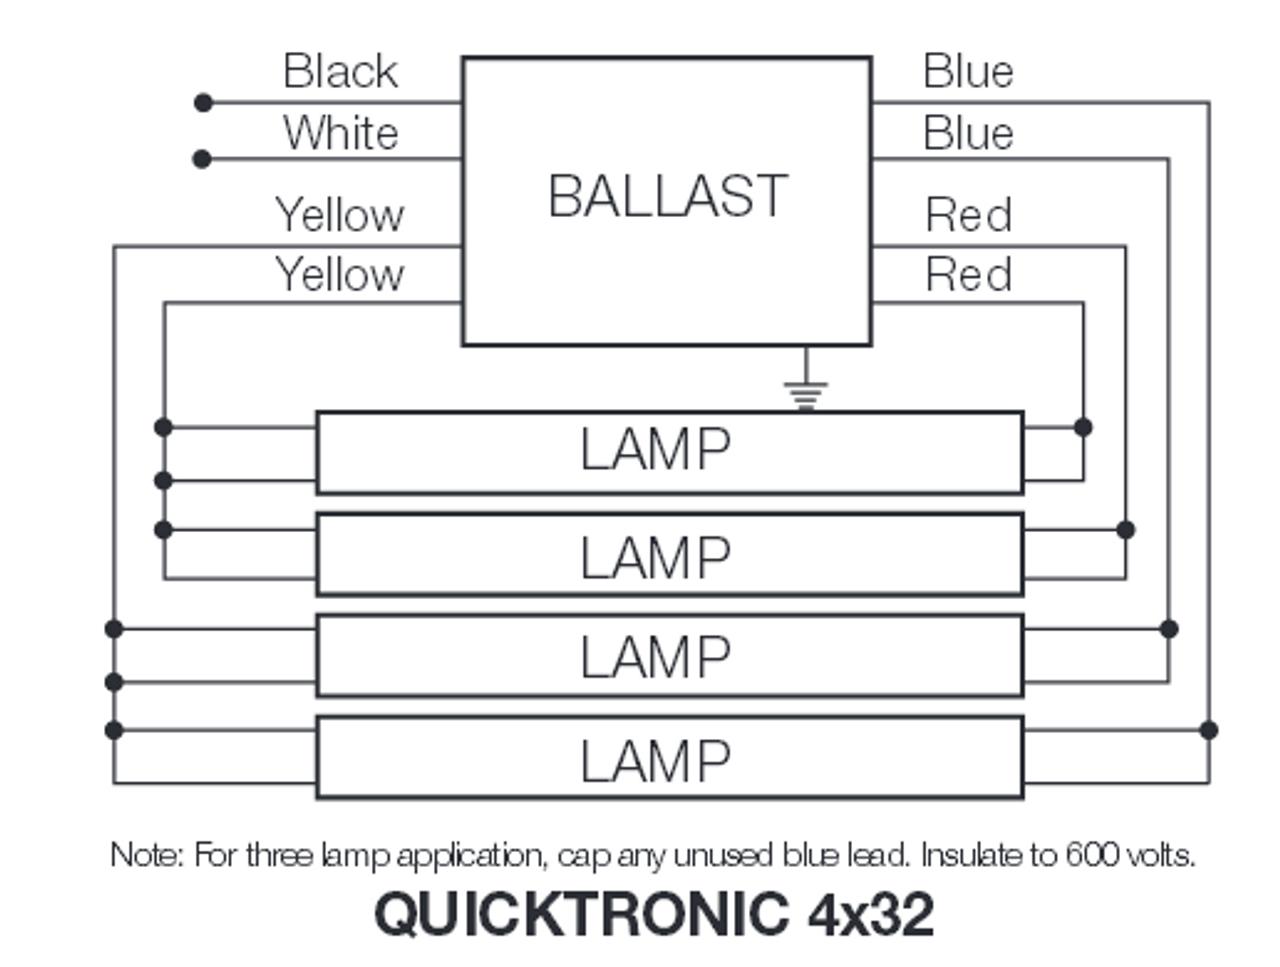 sylvania 49908 4 lamp ballast wiring diagram trusted wiring Philips Ballast Wiring Diagram sylvania 49908 4 lamp ballast wiring diagram wiring diagram libraries 4 light switch wiring diagram qtp4x32t8